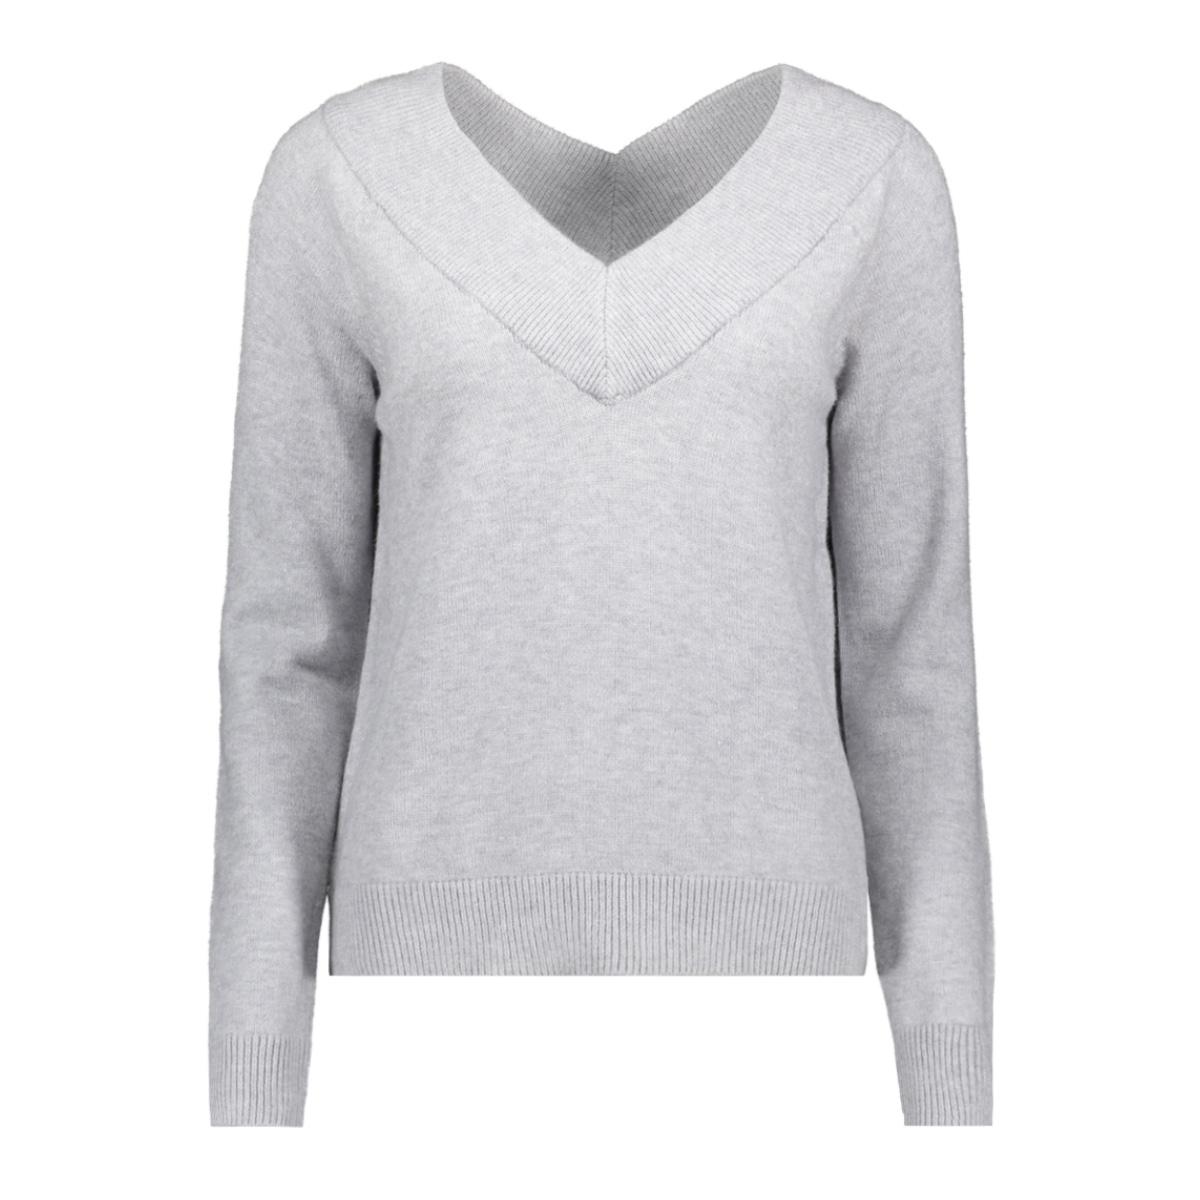 viril l/s db v-neck knit top-fav nx 14055392 vila trui light grey melange